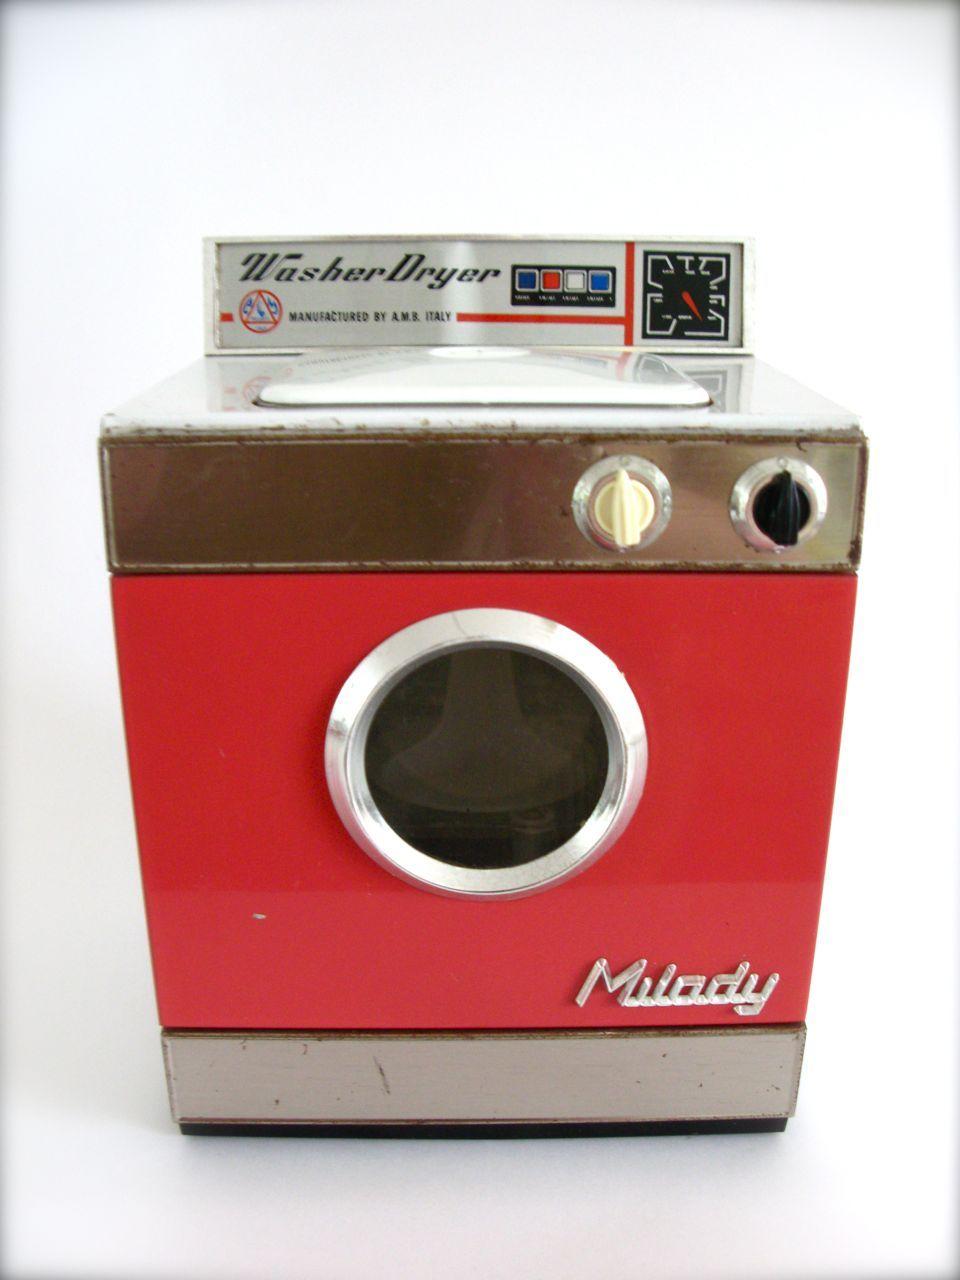 jouet vintage machine laver 1960 vintage vendre. Black Bedroom Furniture Sets. Home Design Ideas